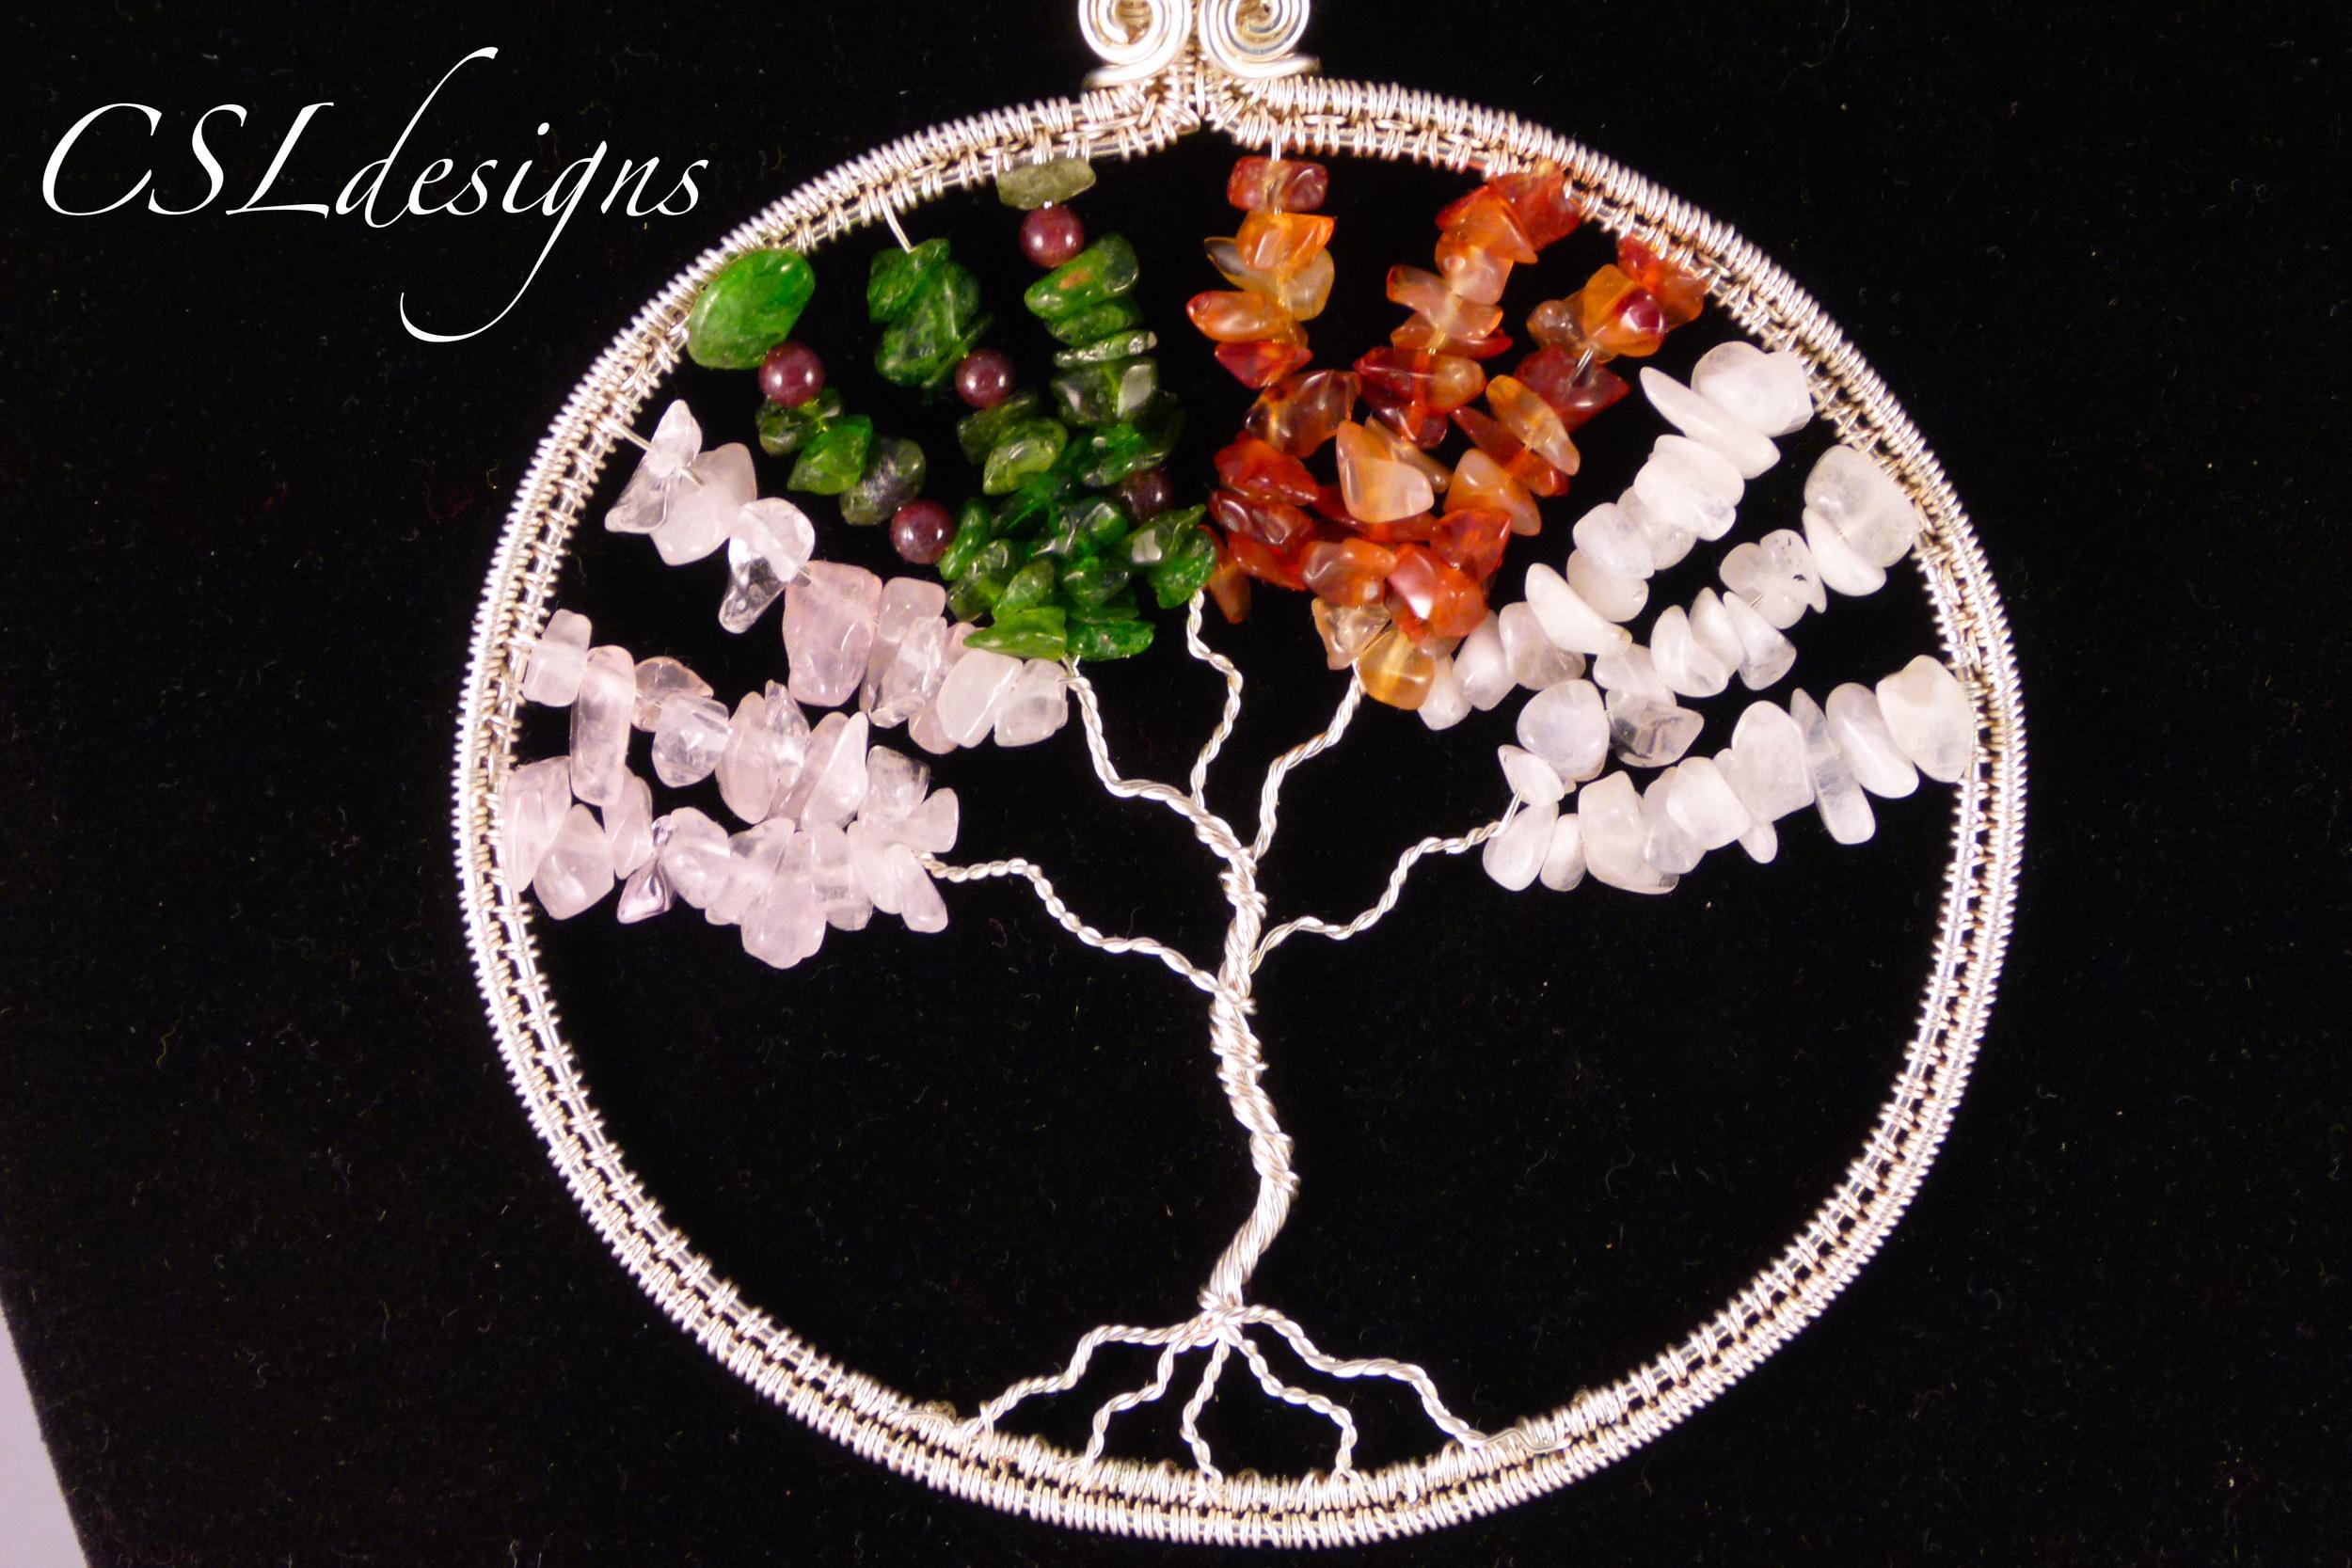 Tree of life all seasons final.jpg